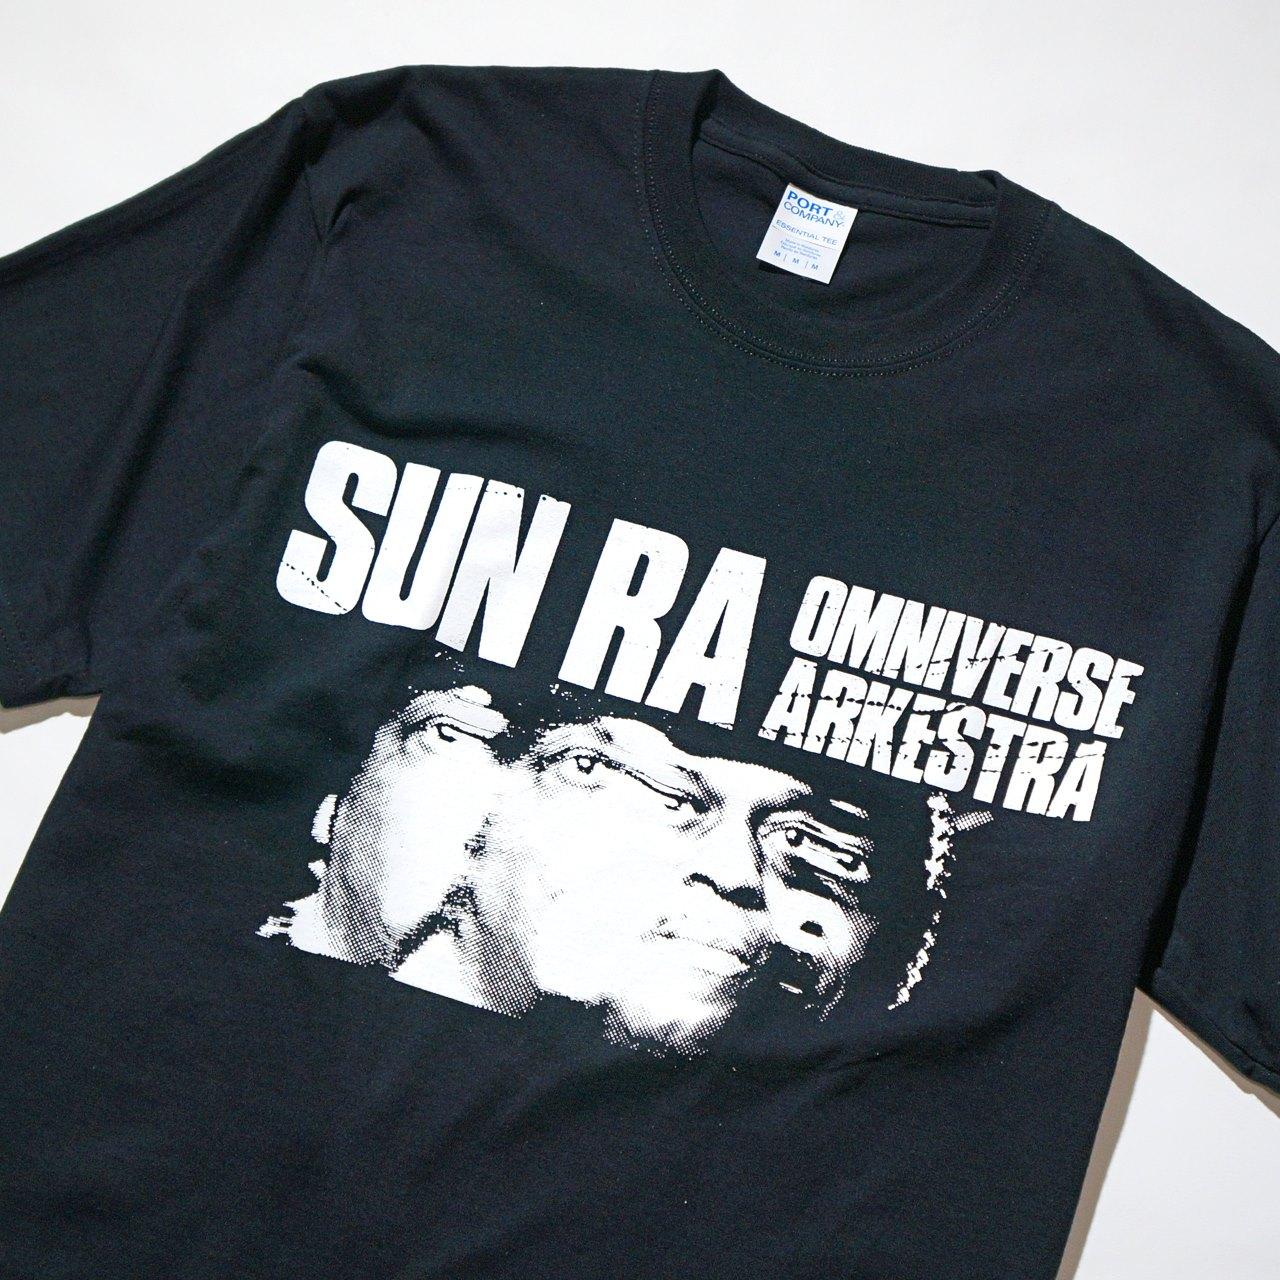 SUN RA & HIS ARKESTRA Tシャツ Omniverse Arkestra-Black